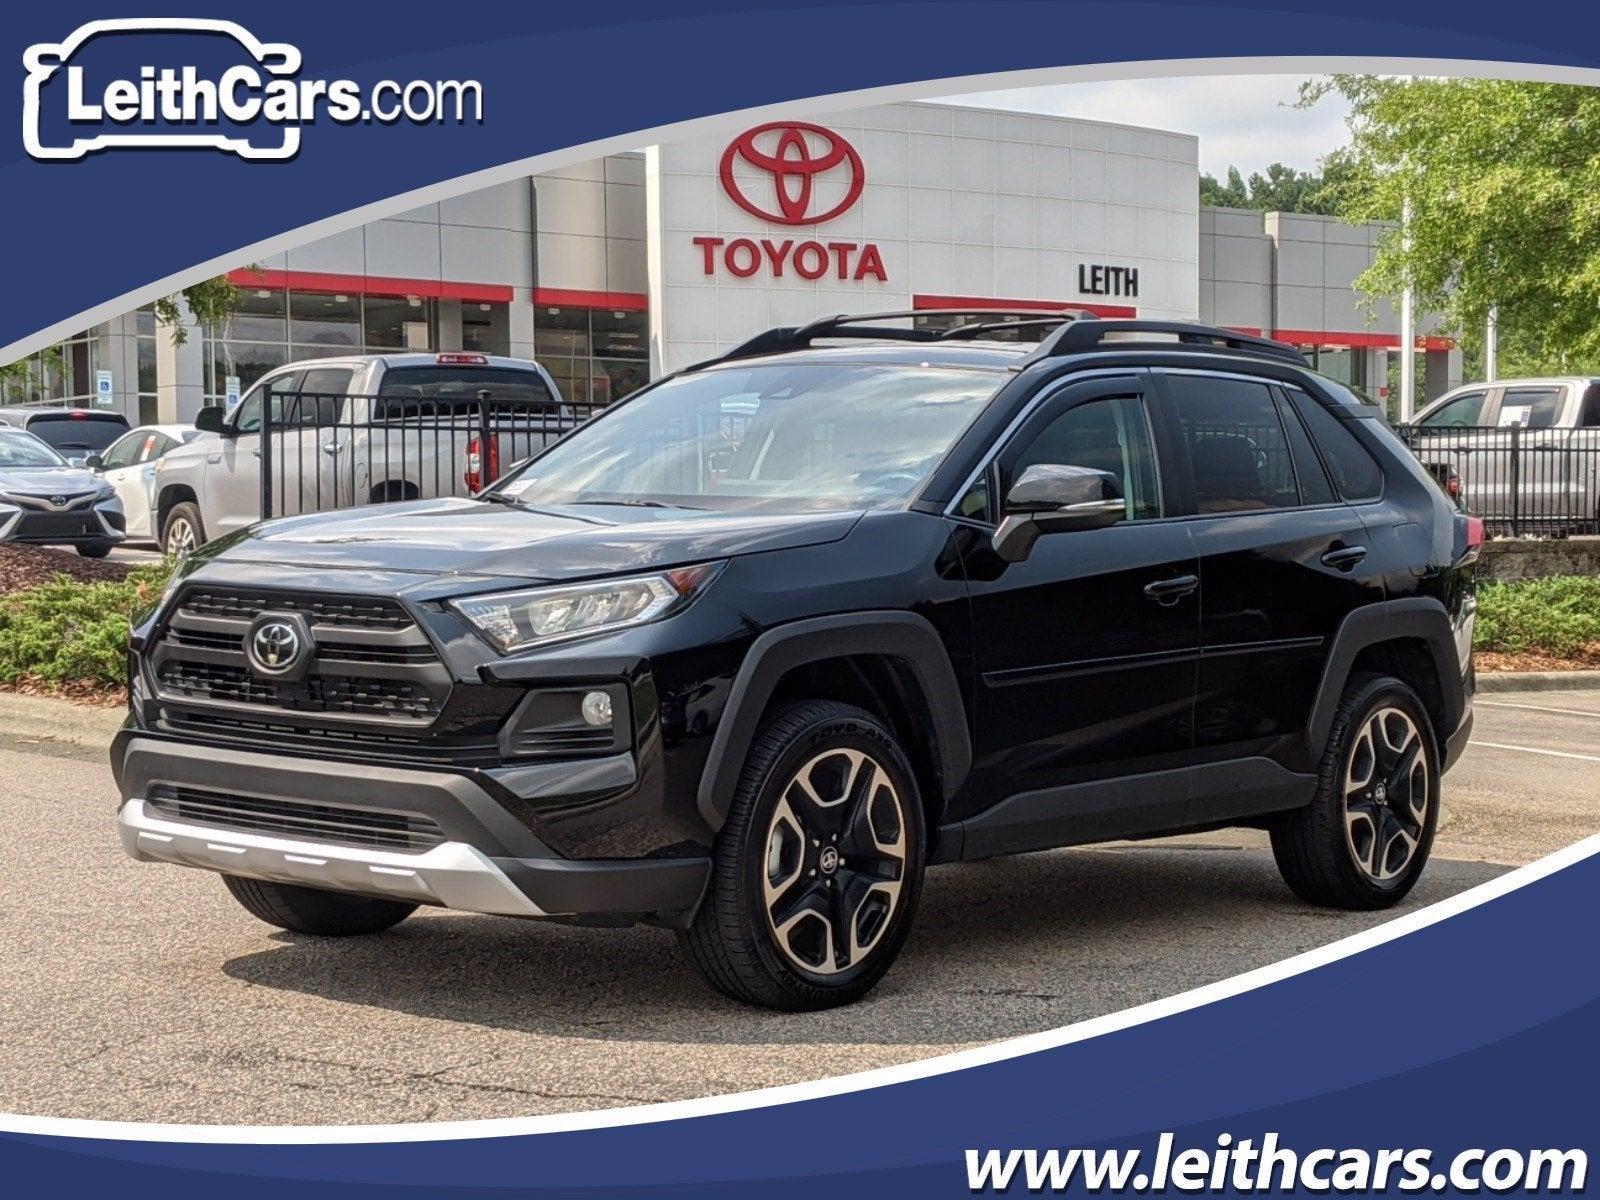 New 2019 Toyota Rav4 Adventure Awd North Carolina 2t3j1rfv5kw007825